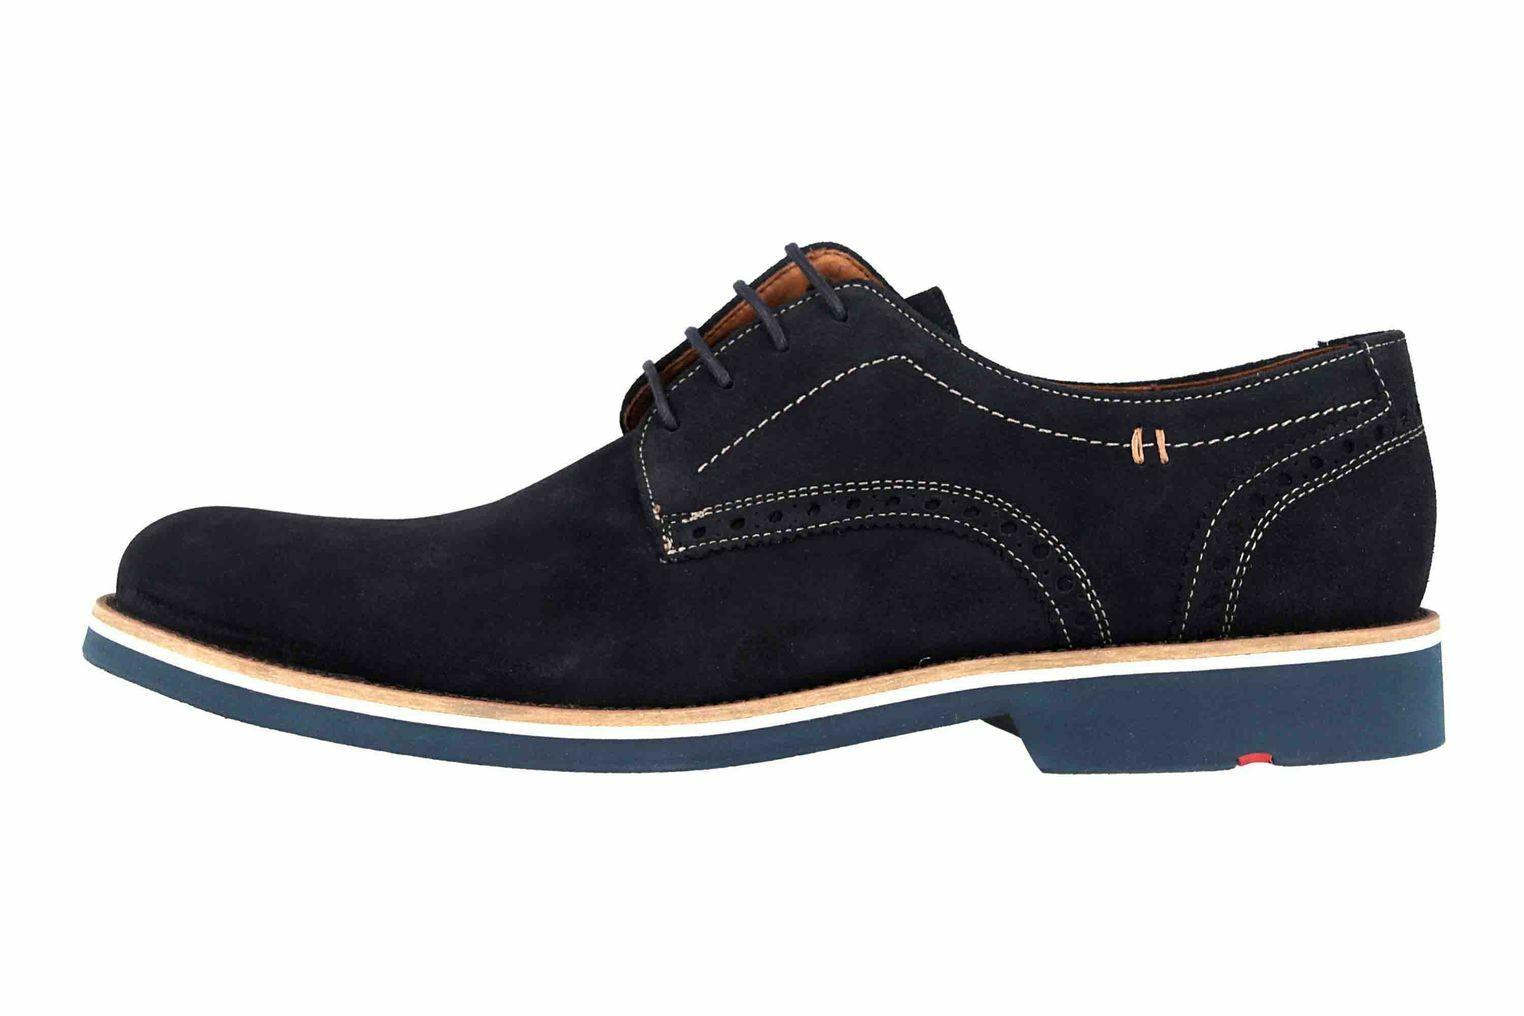 Lloyd Floyd Business-zapatos en pijama azul 17-118-29 grandes zapatos caballero caballero caballero 5930e6